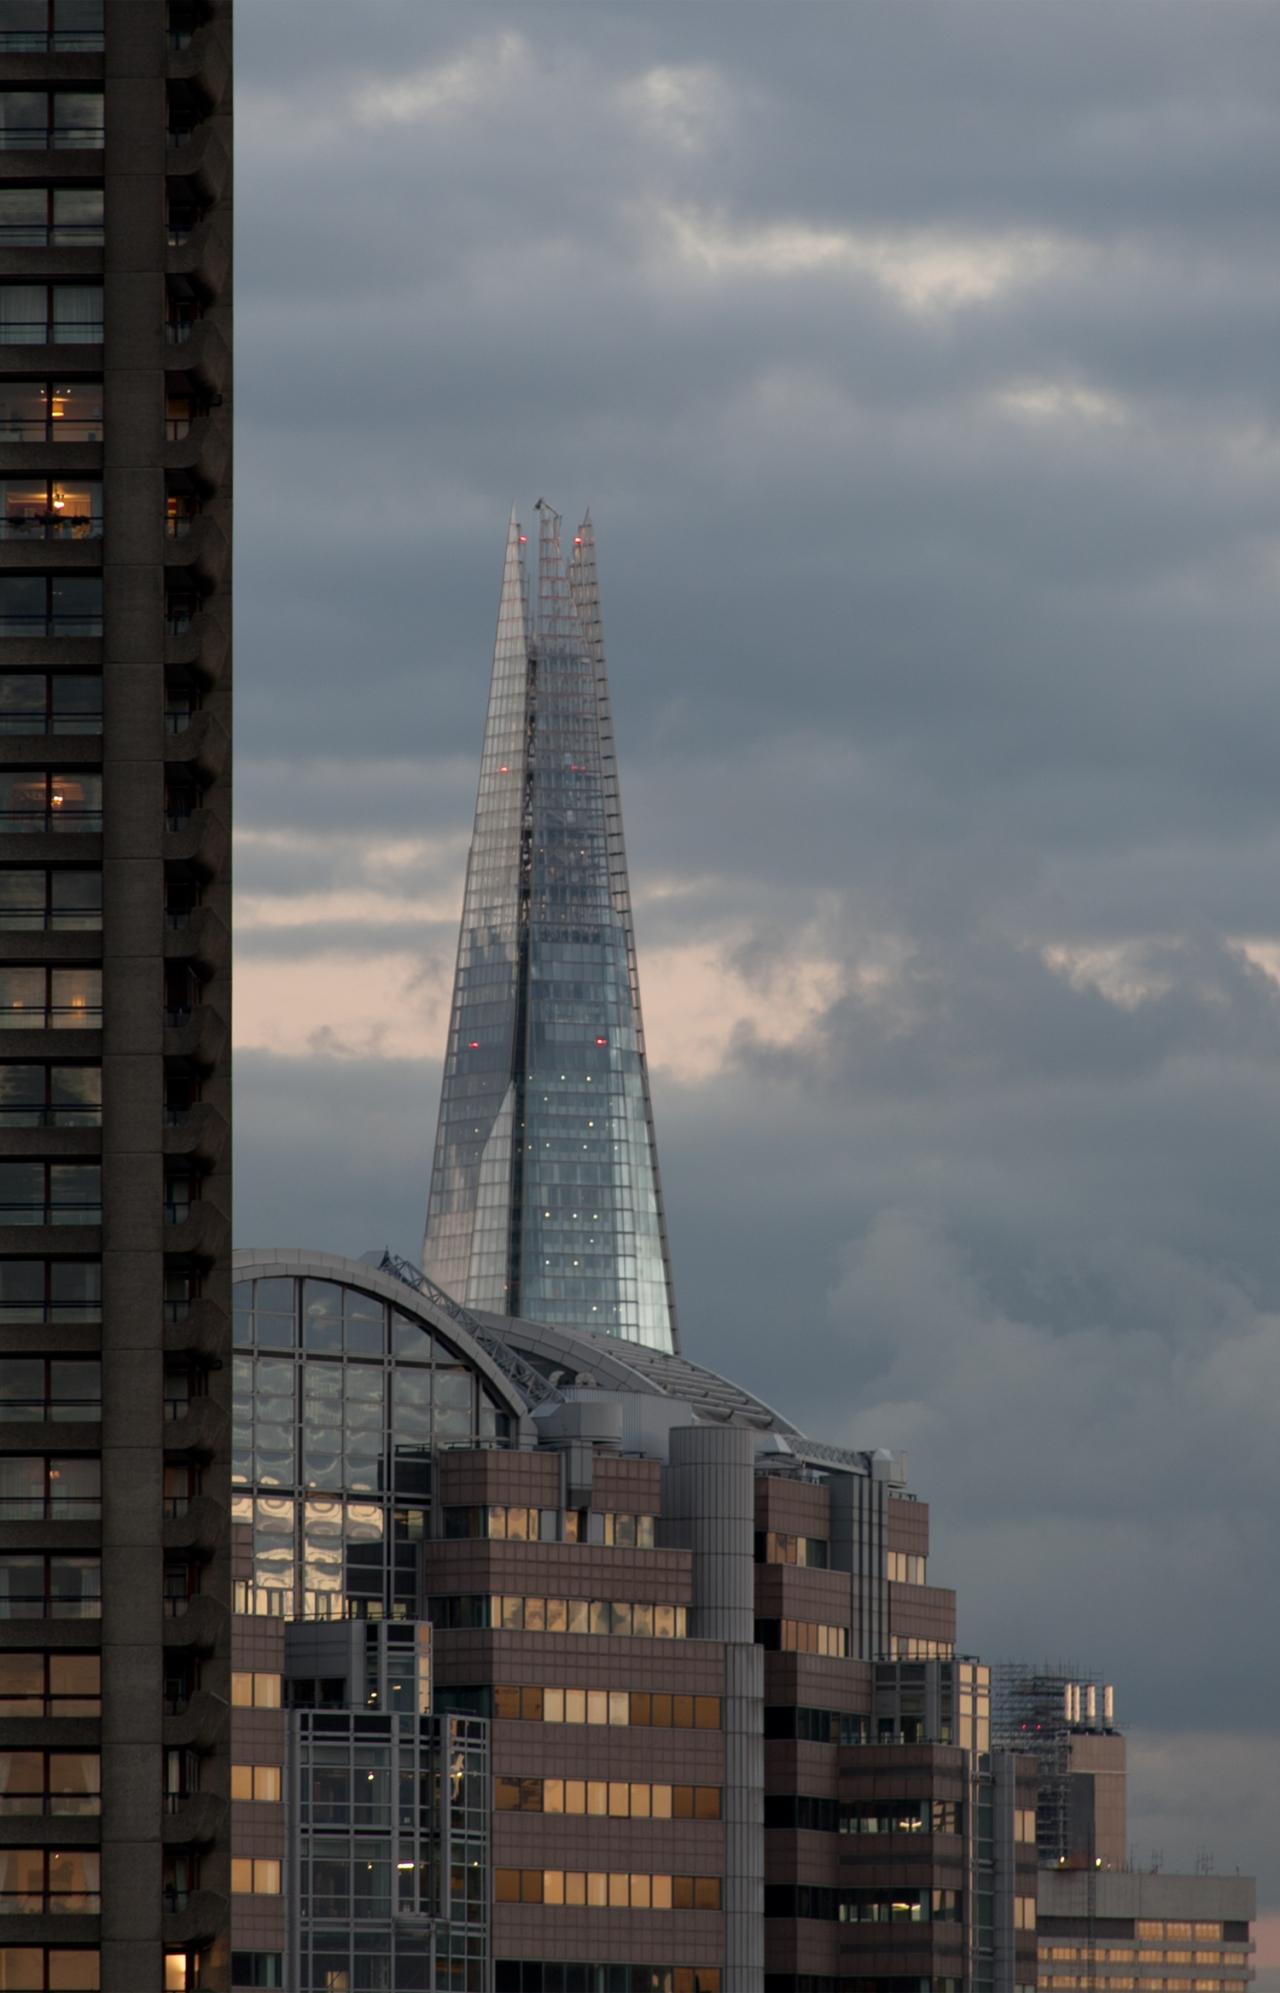 London Sept 18, 2013